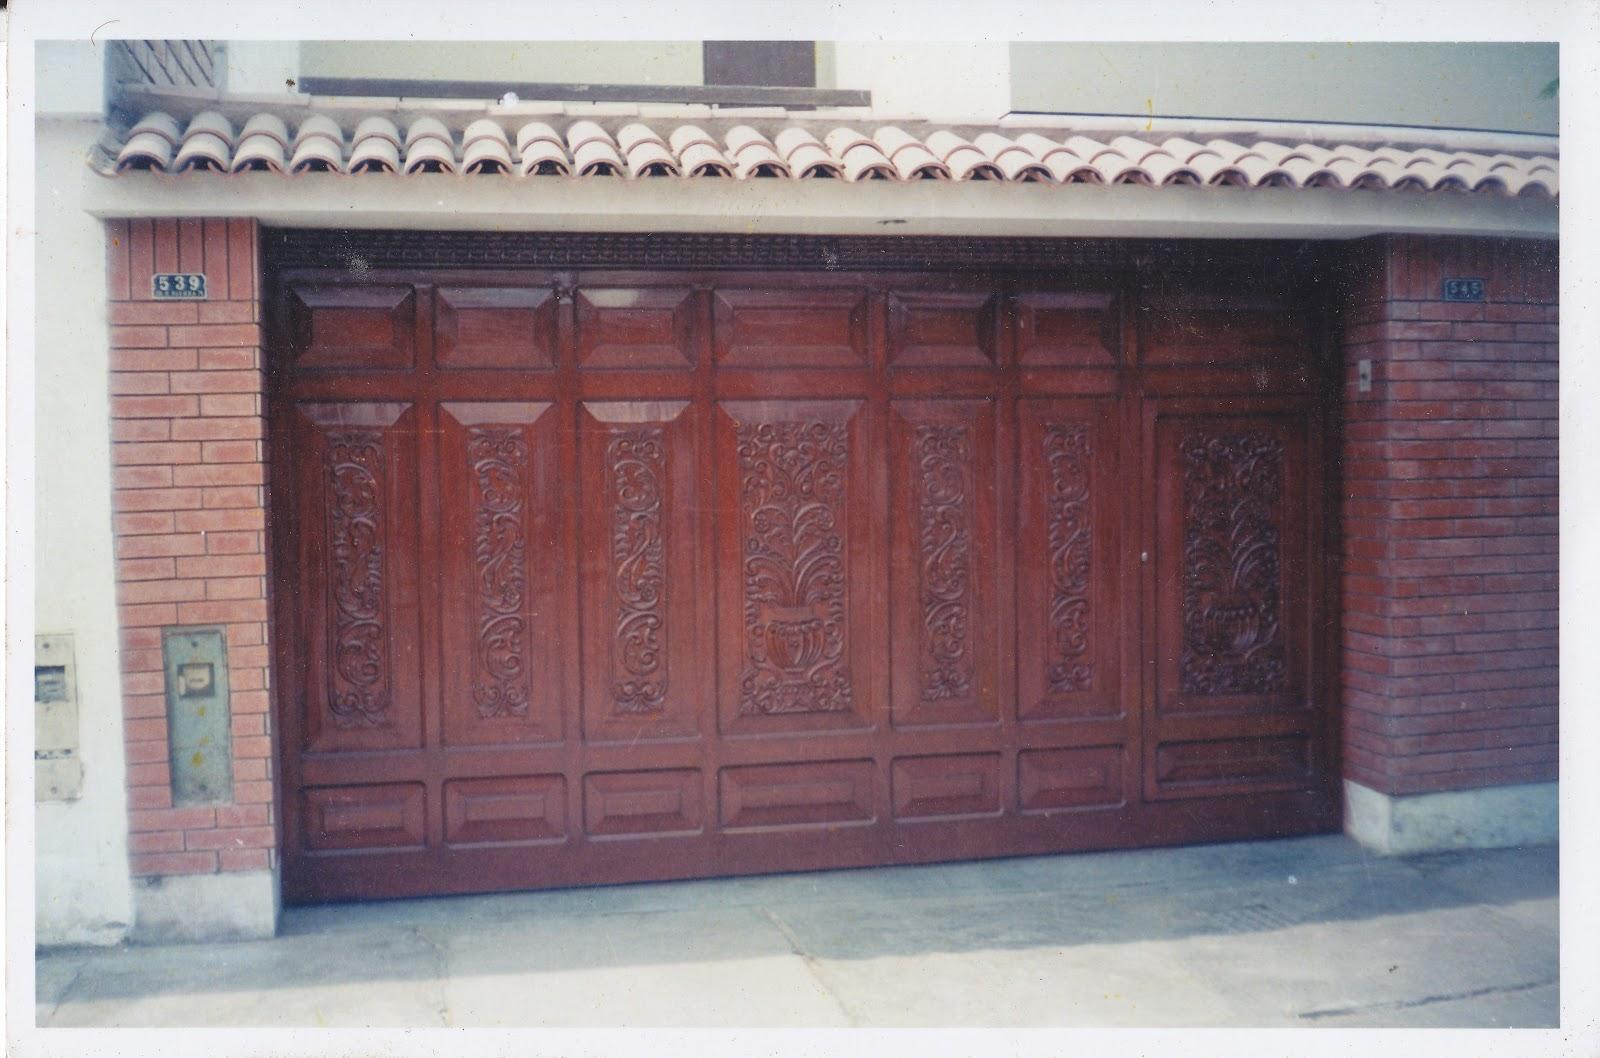 Puertas garaje o cochera fabrica de puertas blindadas auto design tech - Puertas de cochera ...